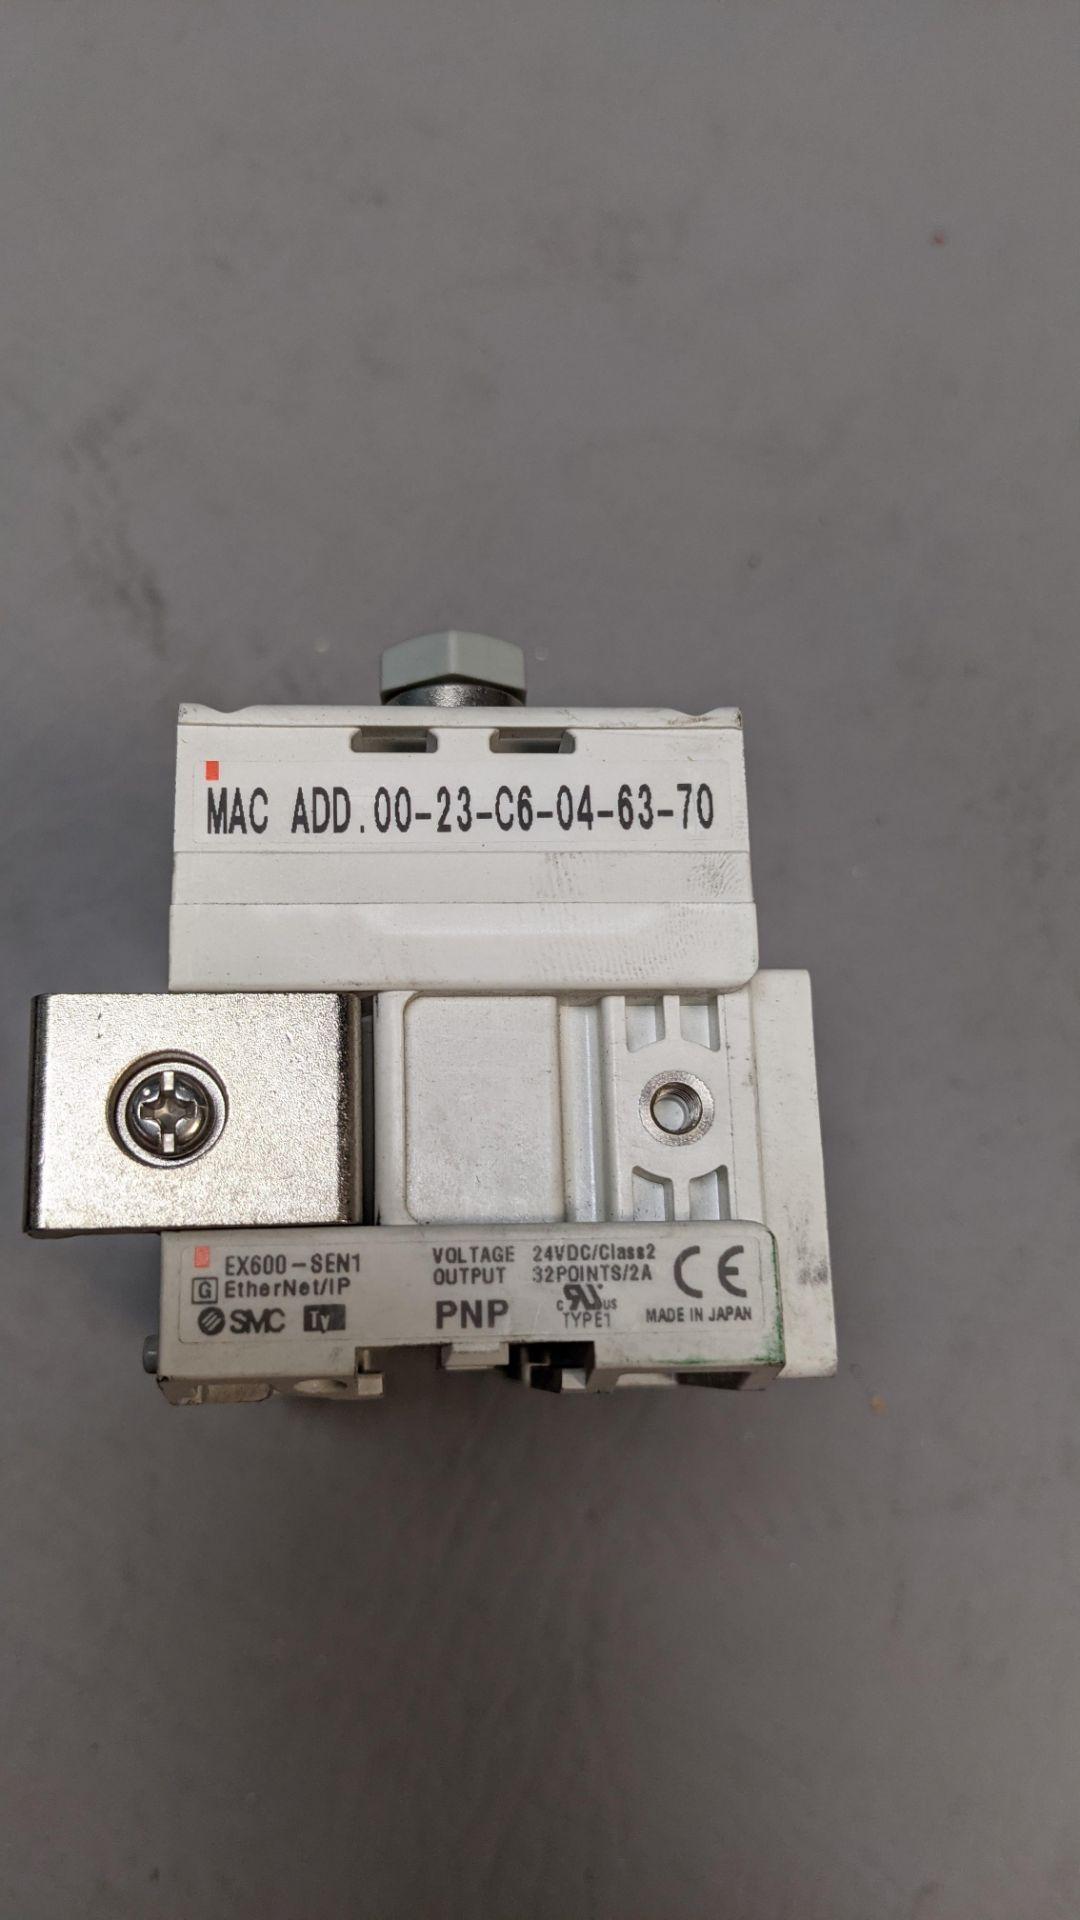 SMC ETHERNET/IP MODULE - Image 2 of 2